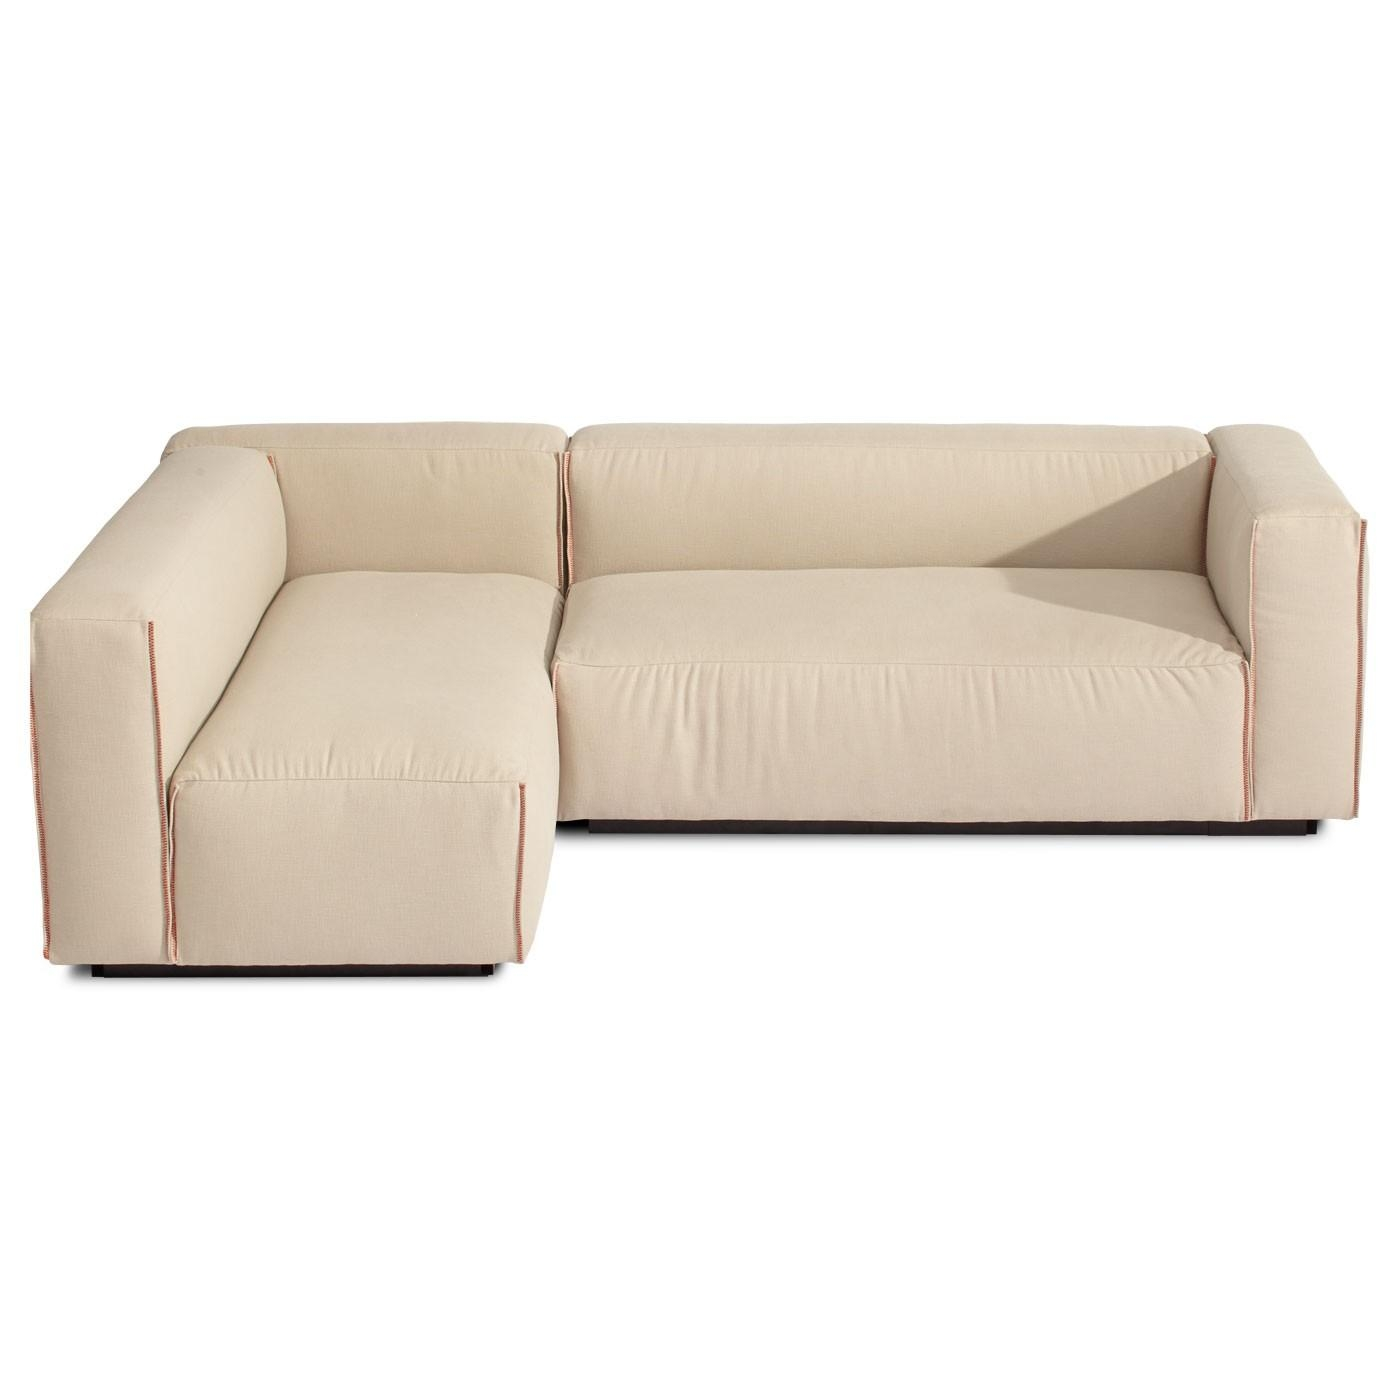 small modular sofa sectionals usa 20 top sectional ideas